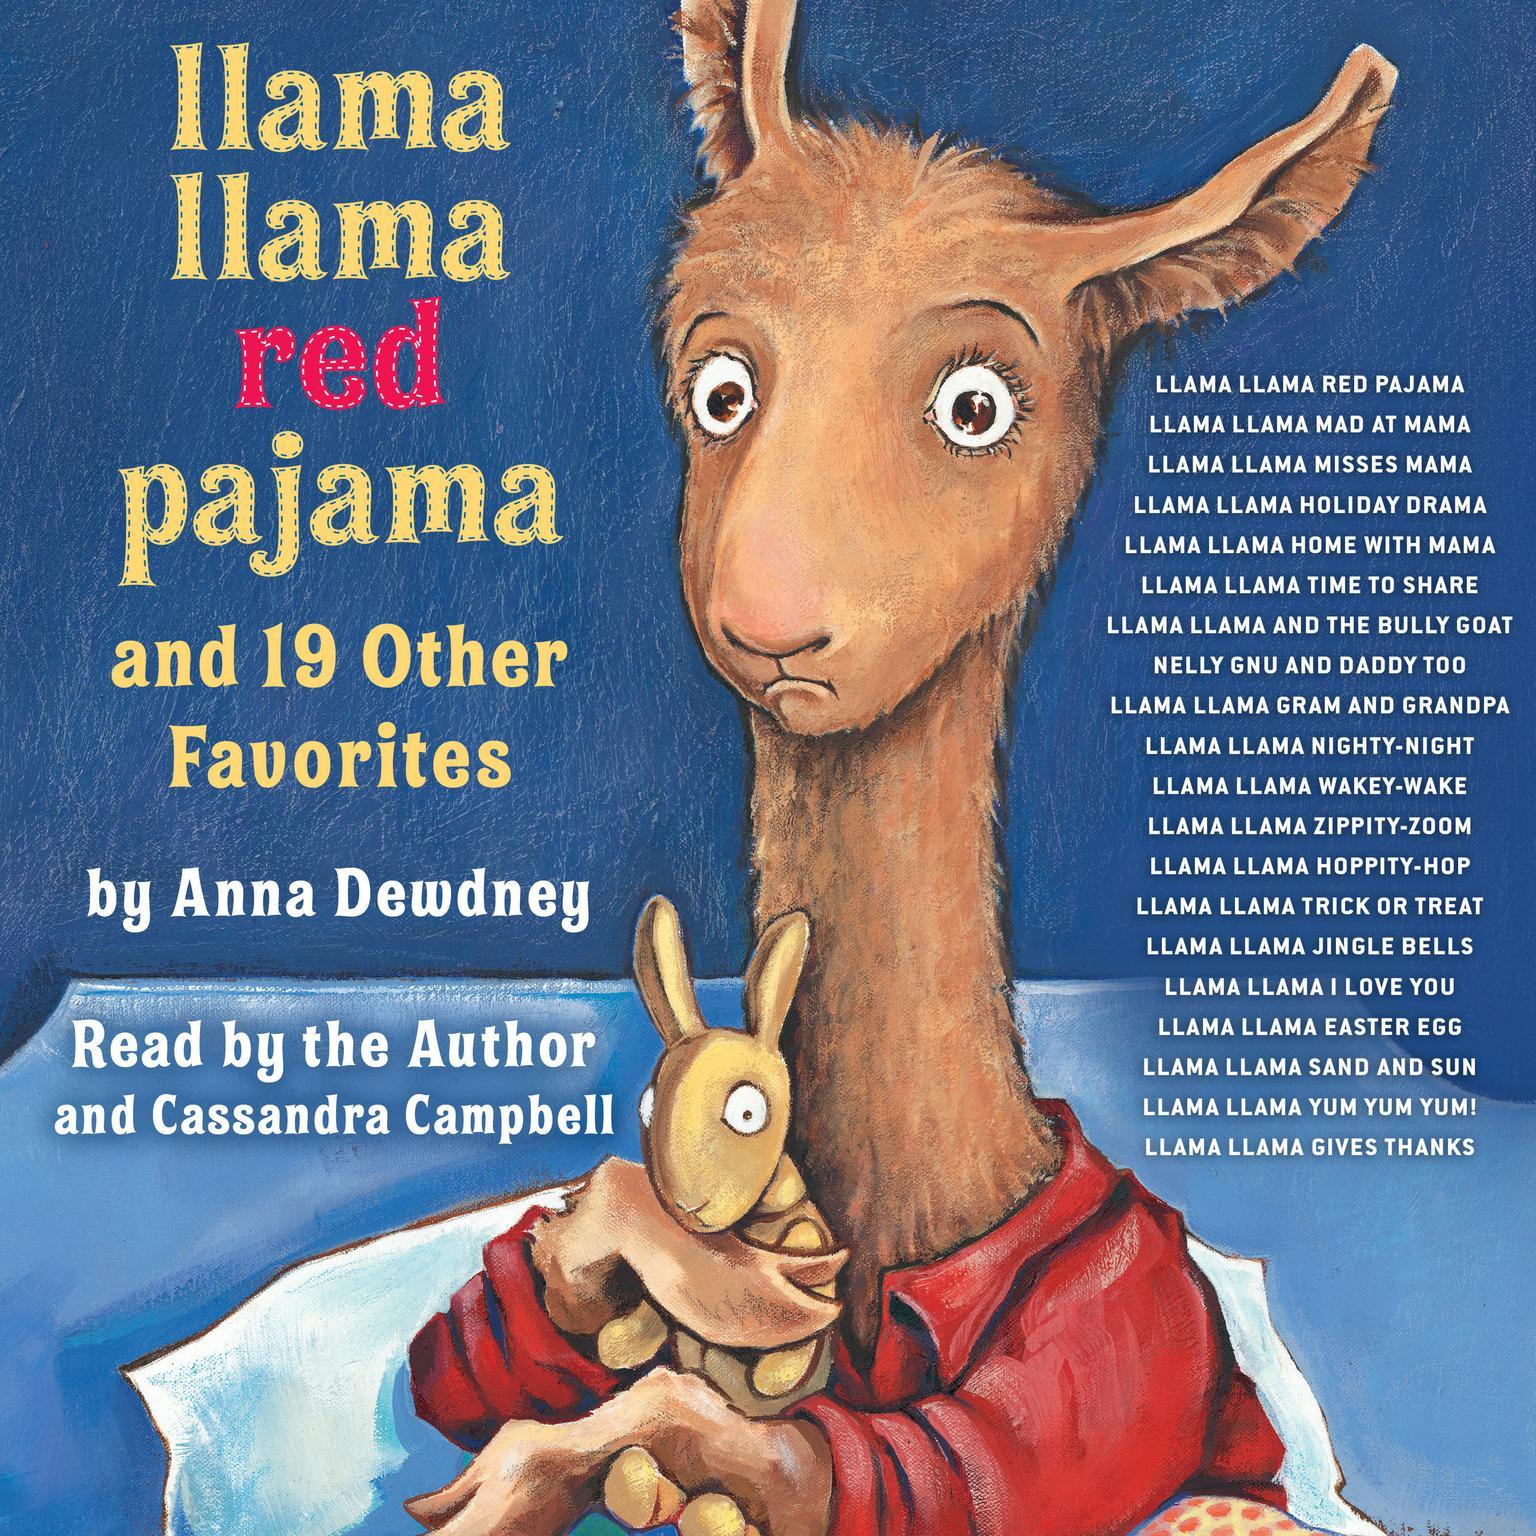 Llama Llama Red Pajama and 19 Other Favorites: Llama Llama Mad at Mama; Llama Llama Misses Mama; Llama Llama Holiday Drama; and More Audiobook, by Anna Dewdney